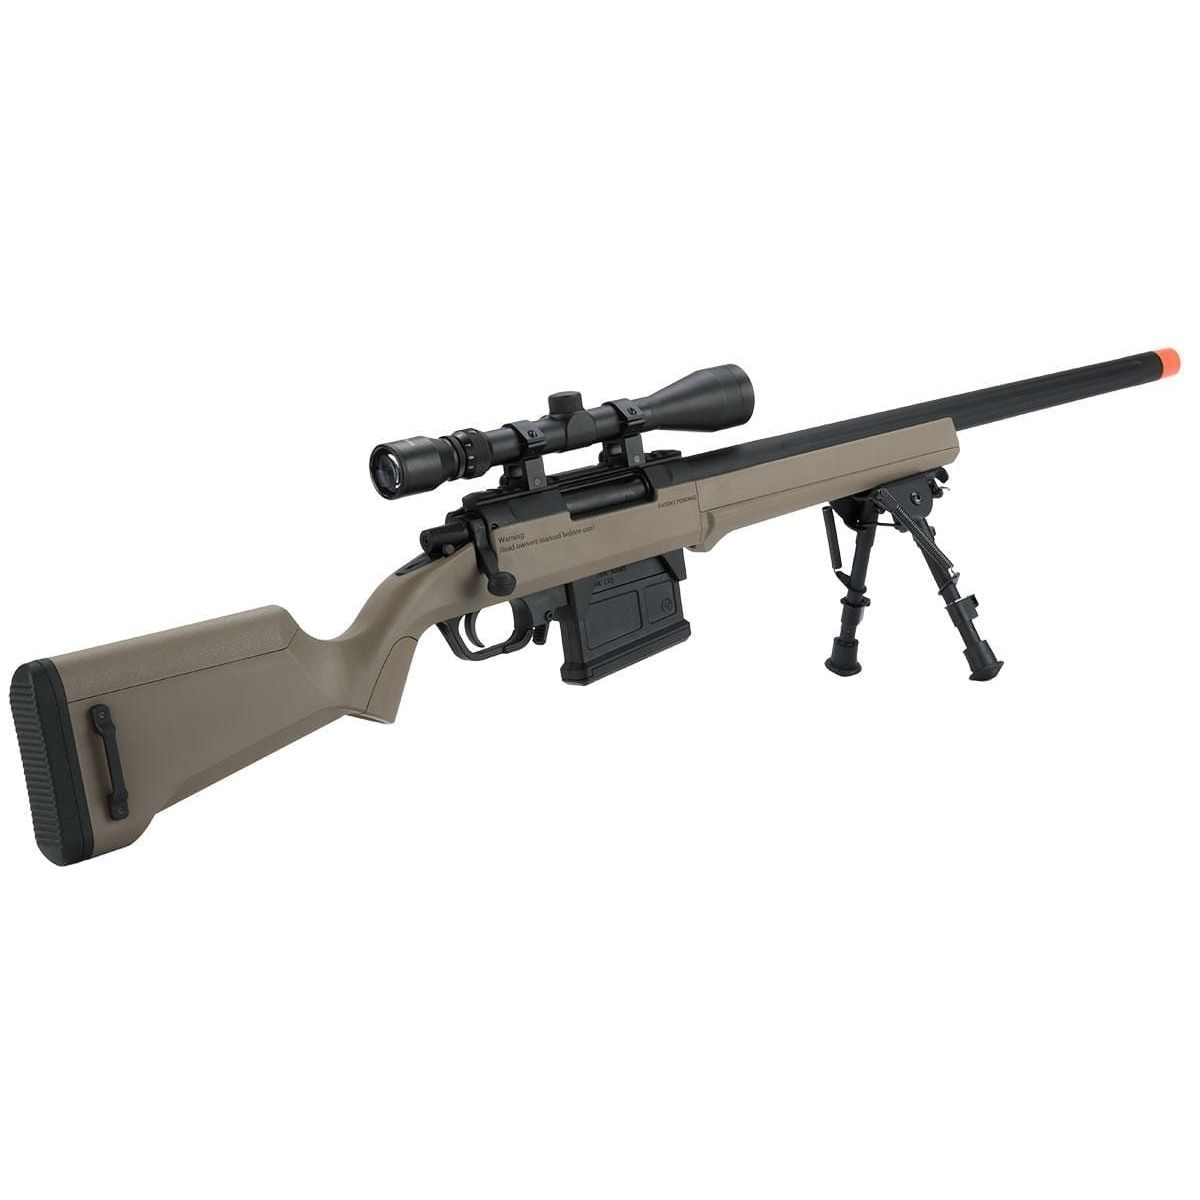 Gen2 S1 Bolt Action Sniper Rifle amoeba striker